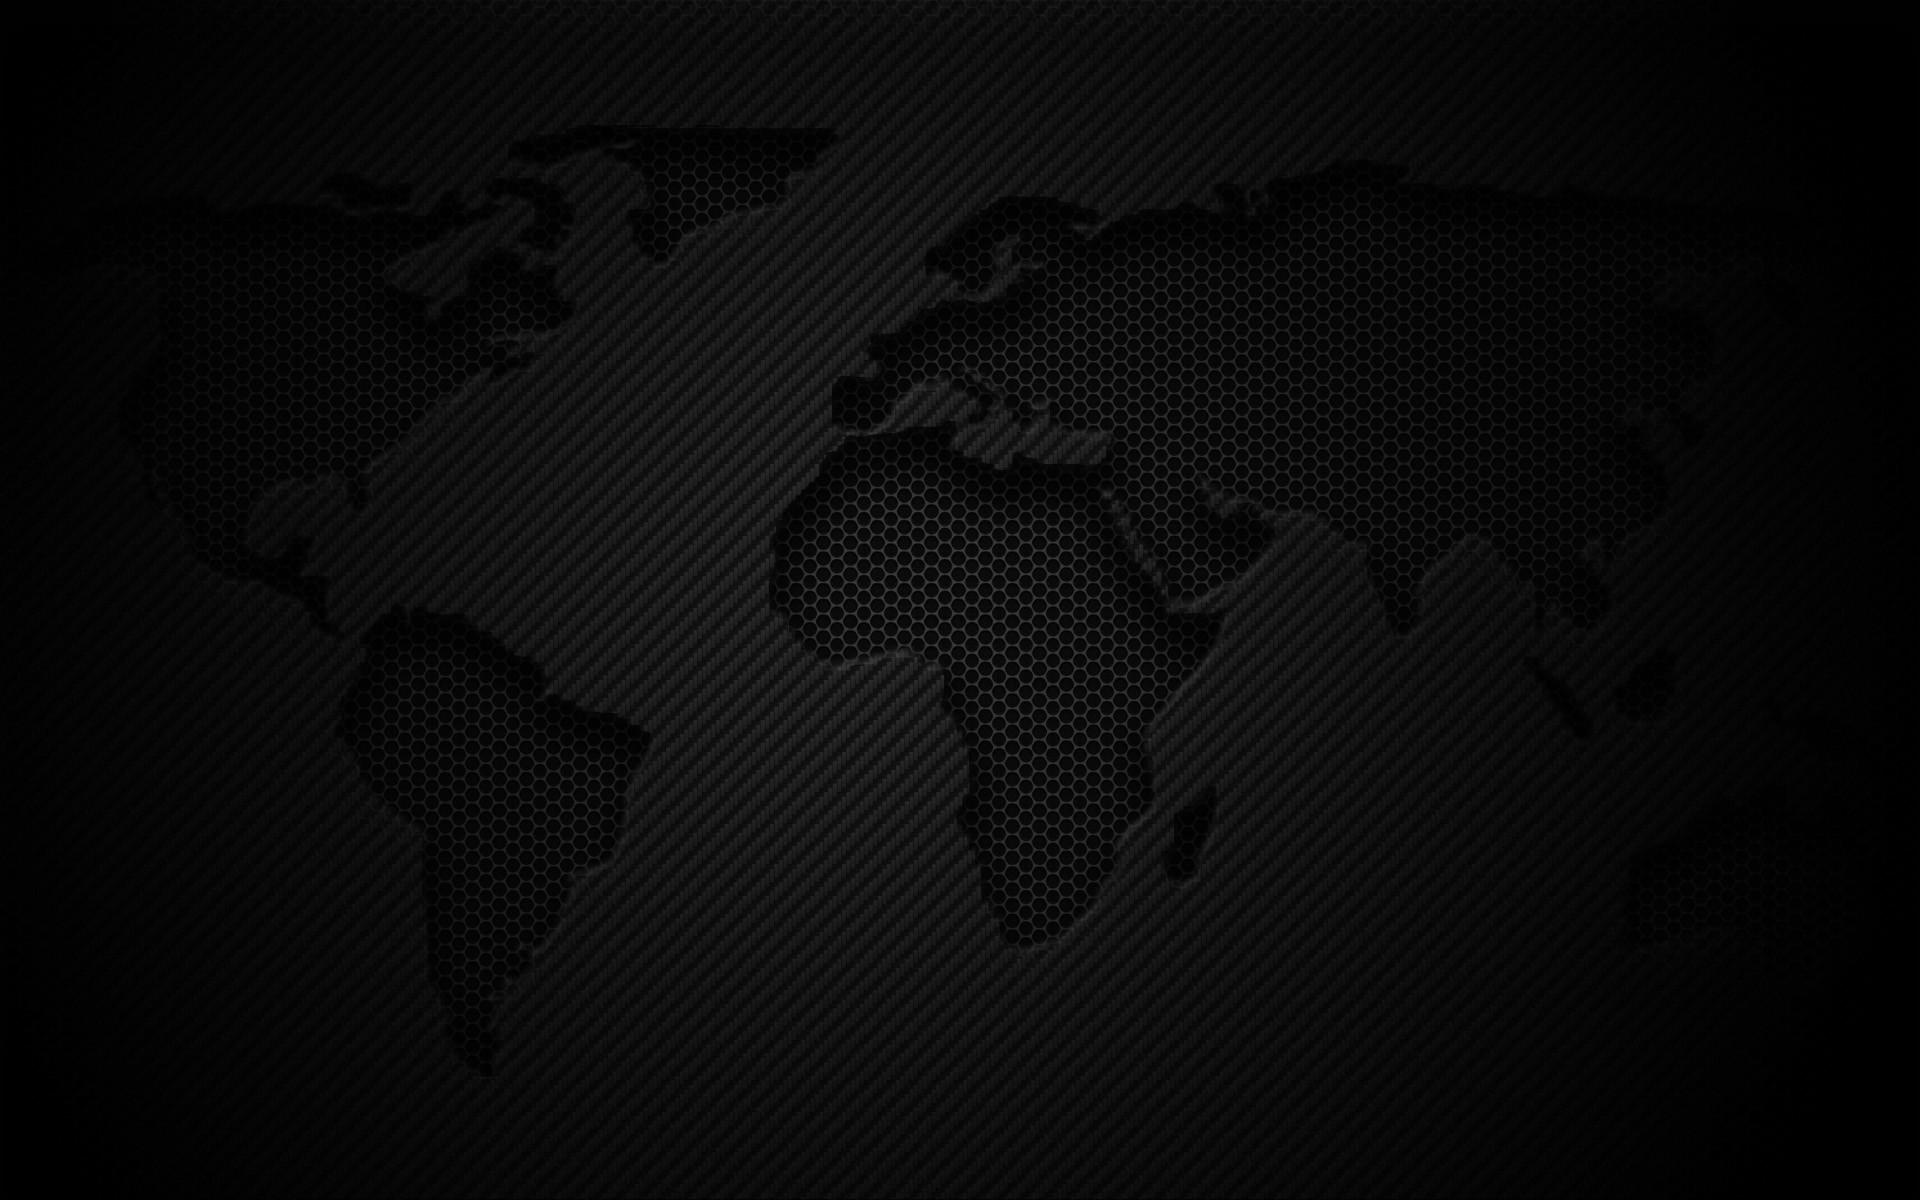 OVO HD Wallpaper – WallpaperSafari